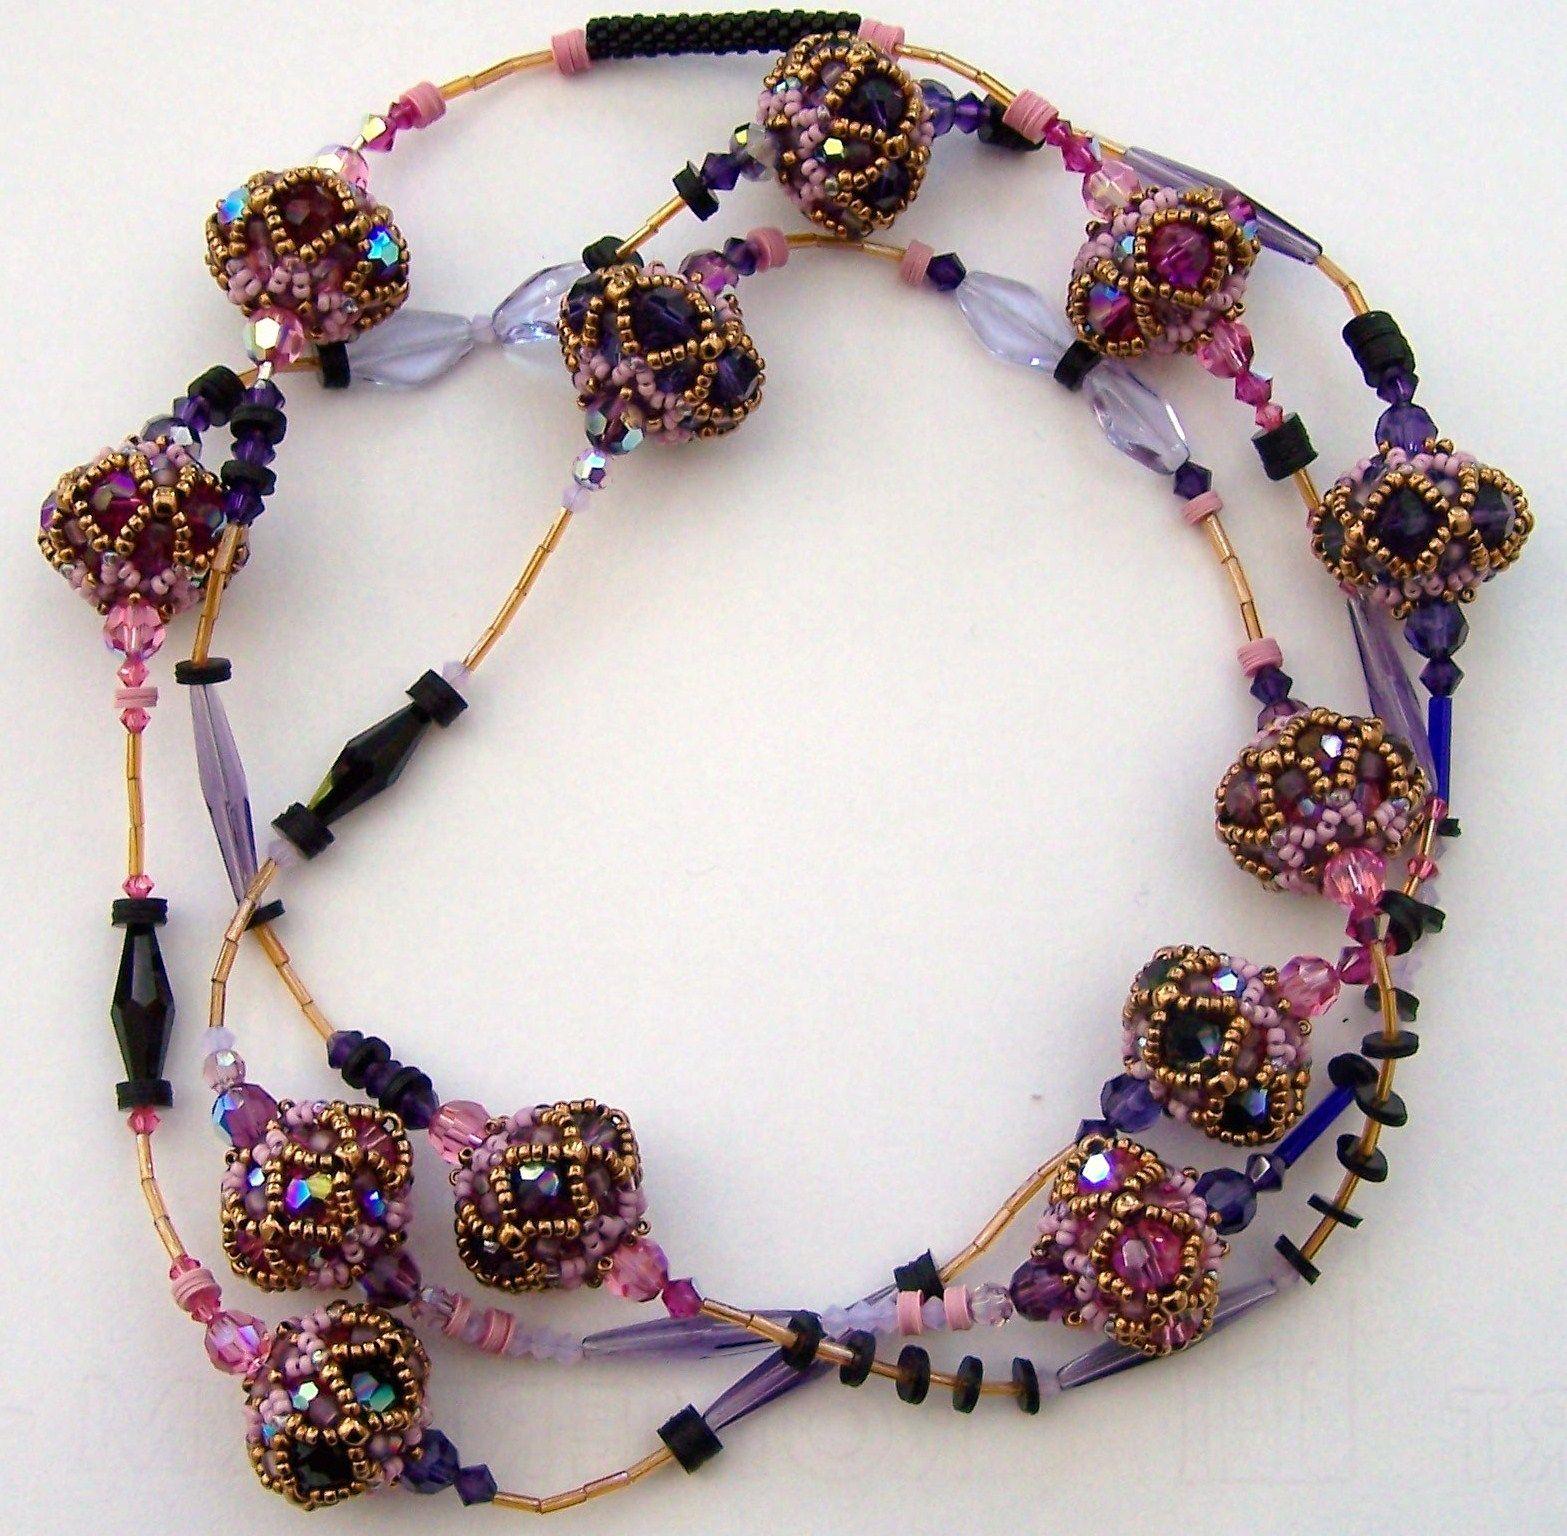 Alle meine Perlen: beaded beads